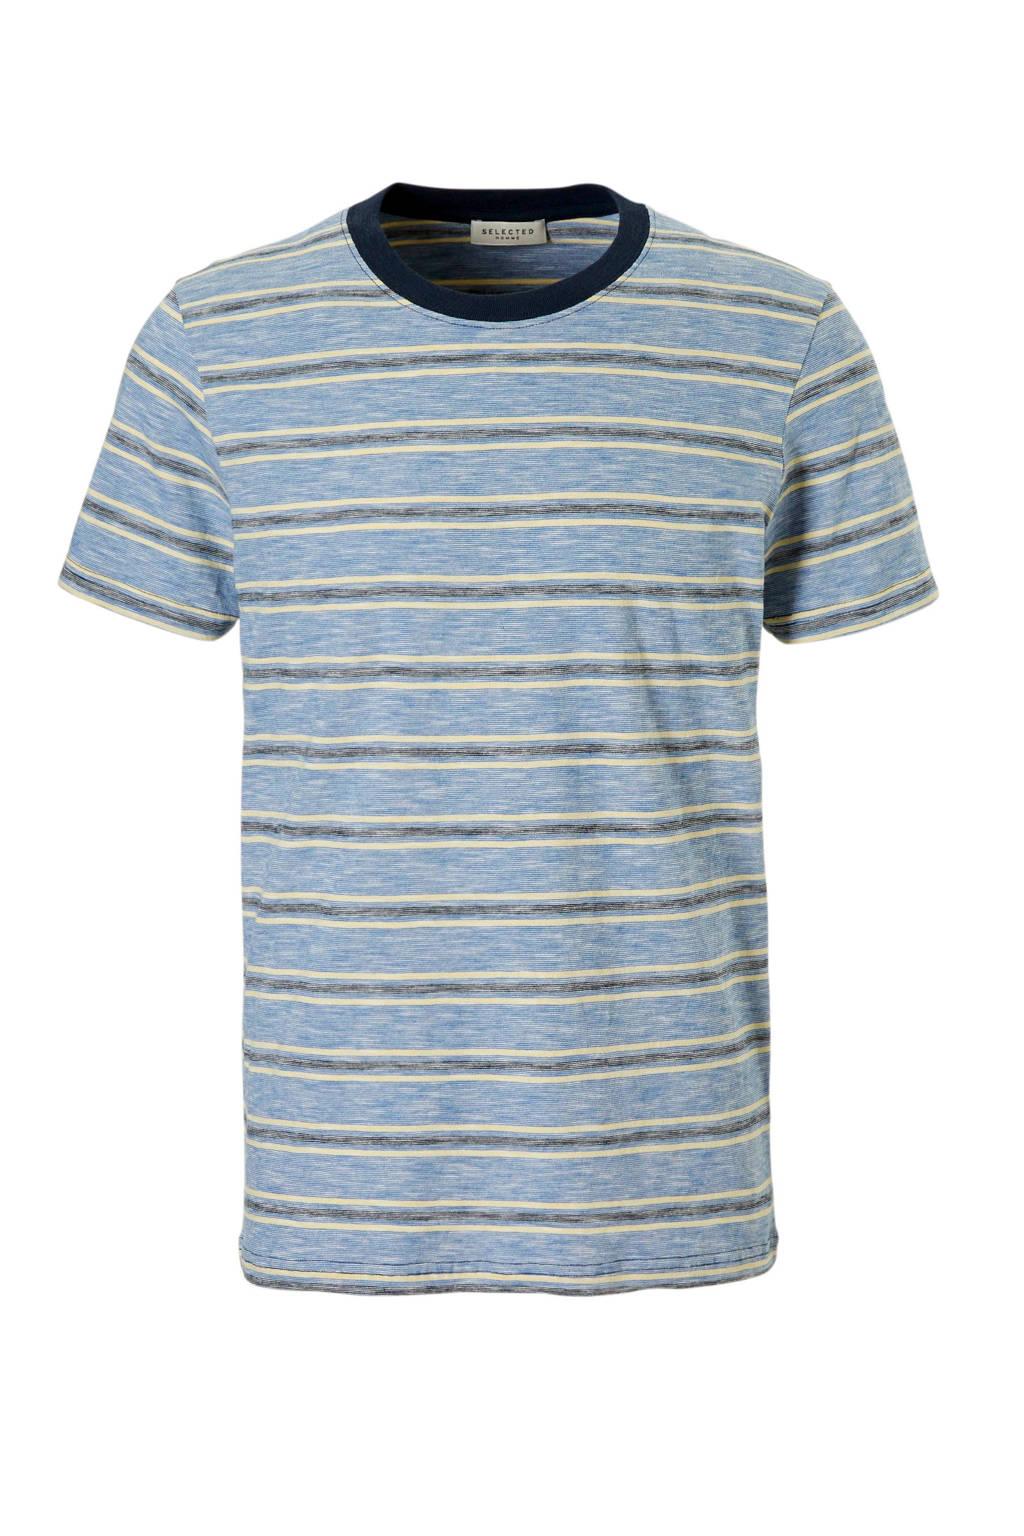 SELECTED HOMME T-shirt Kasper, Blauw/geel